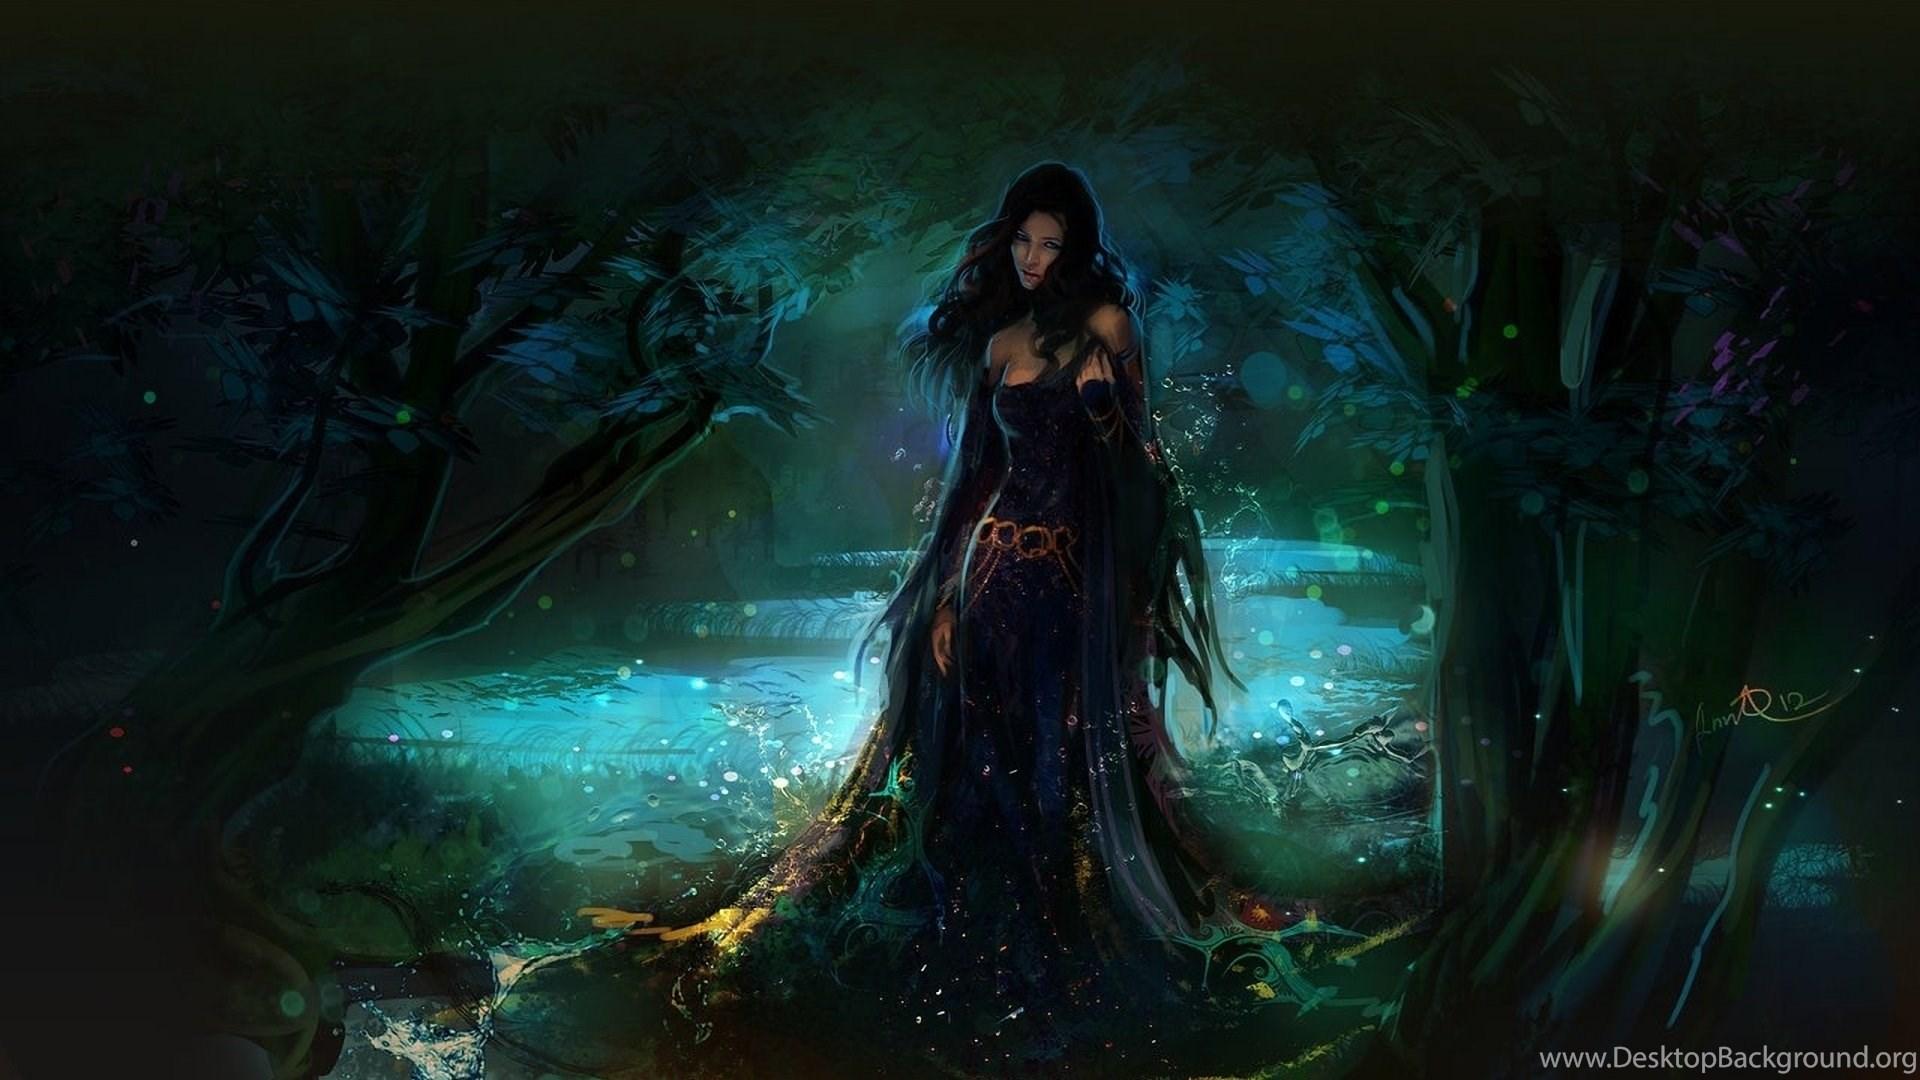 Dark Fantasy Wallpapers For Desktop Background